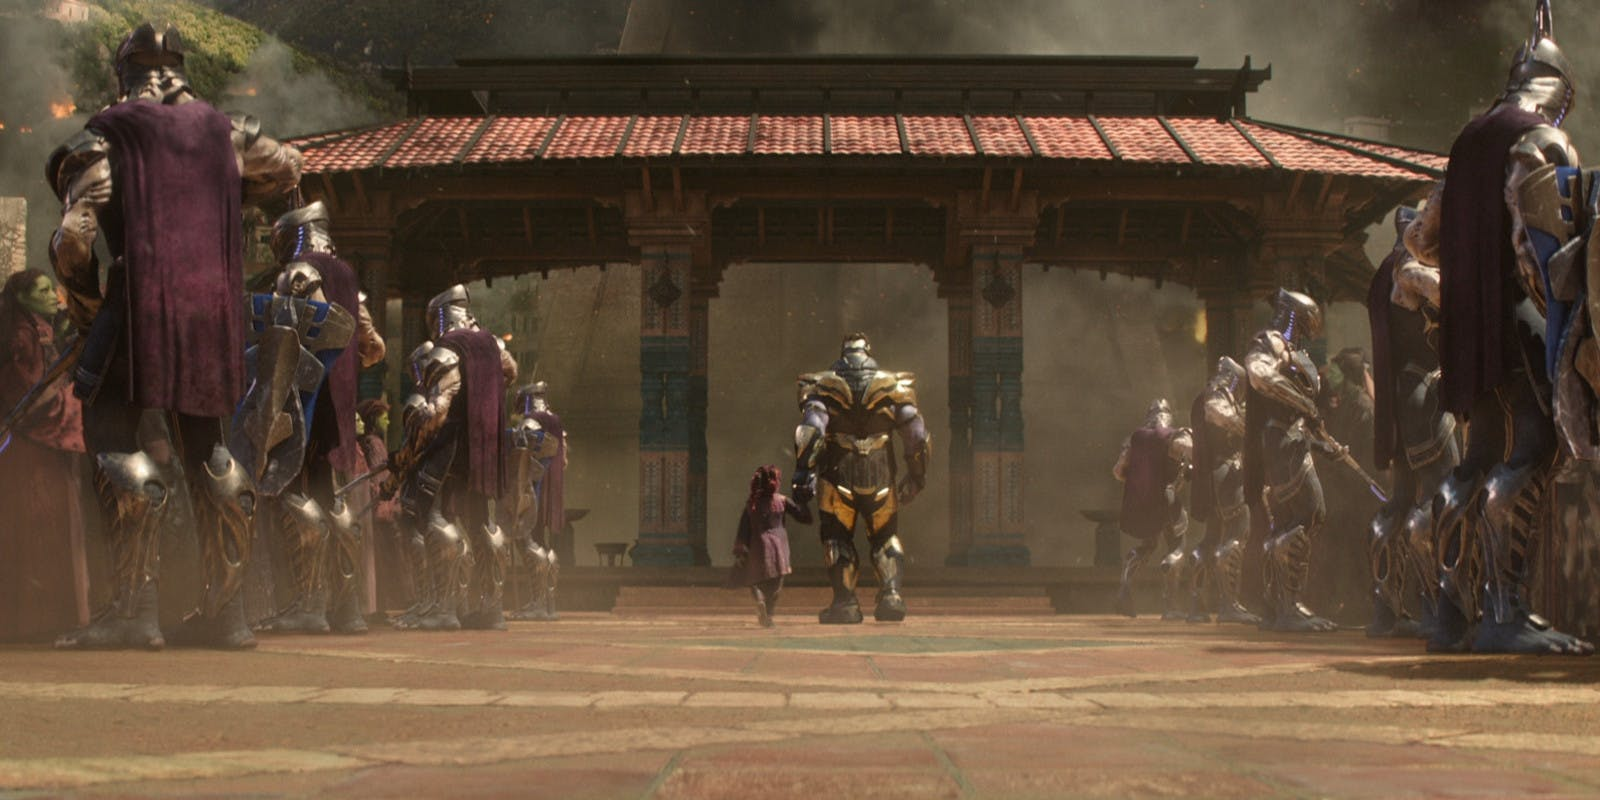 Avengers-Infinity-War-Gamora-Walks-With-Thanos